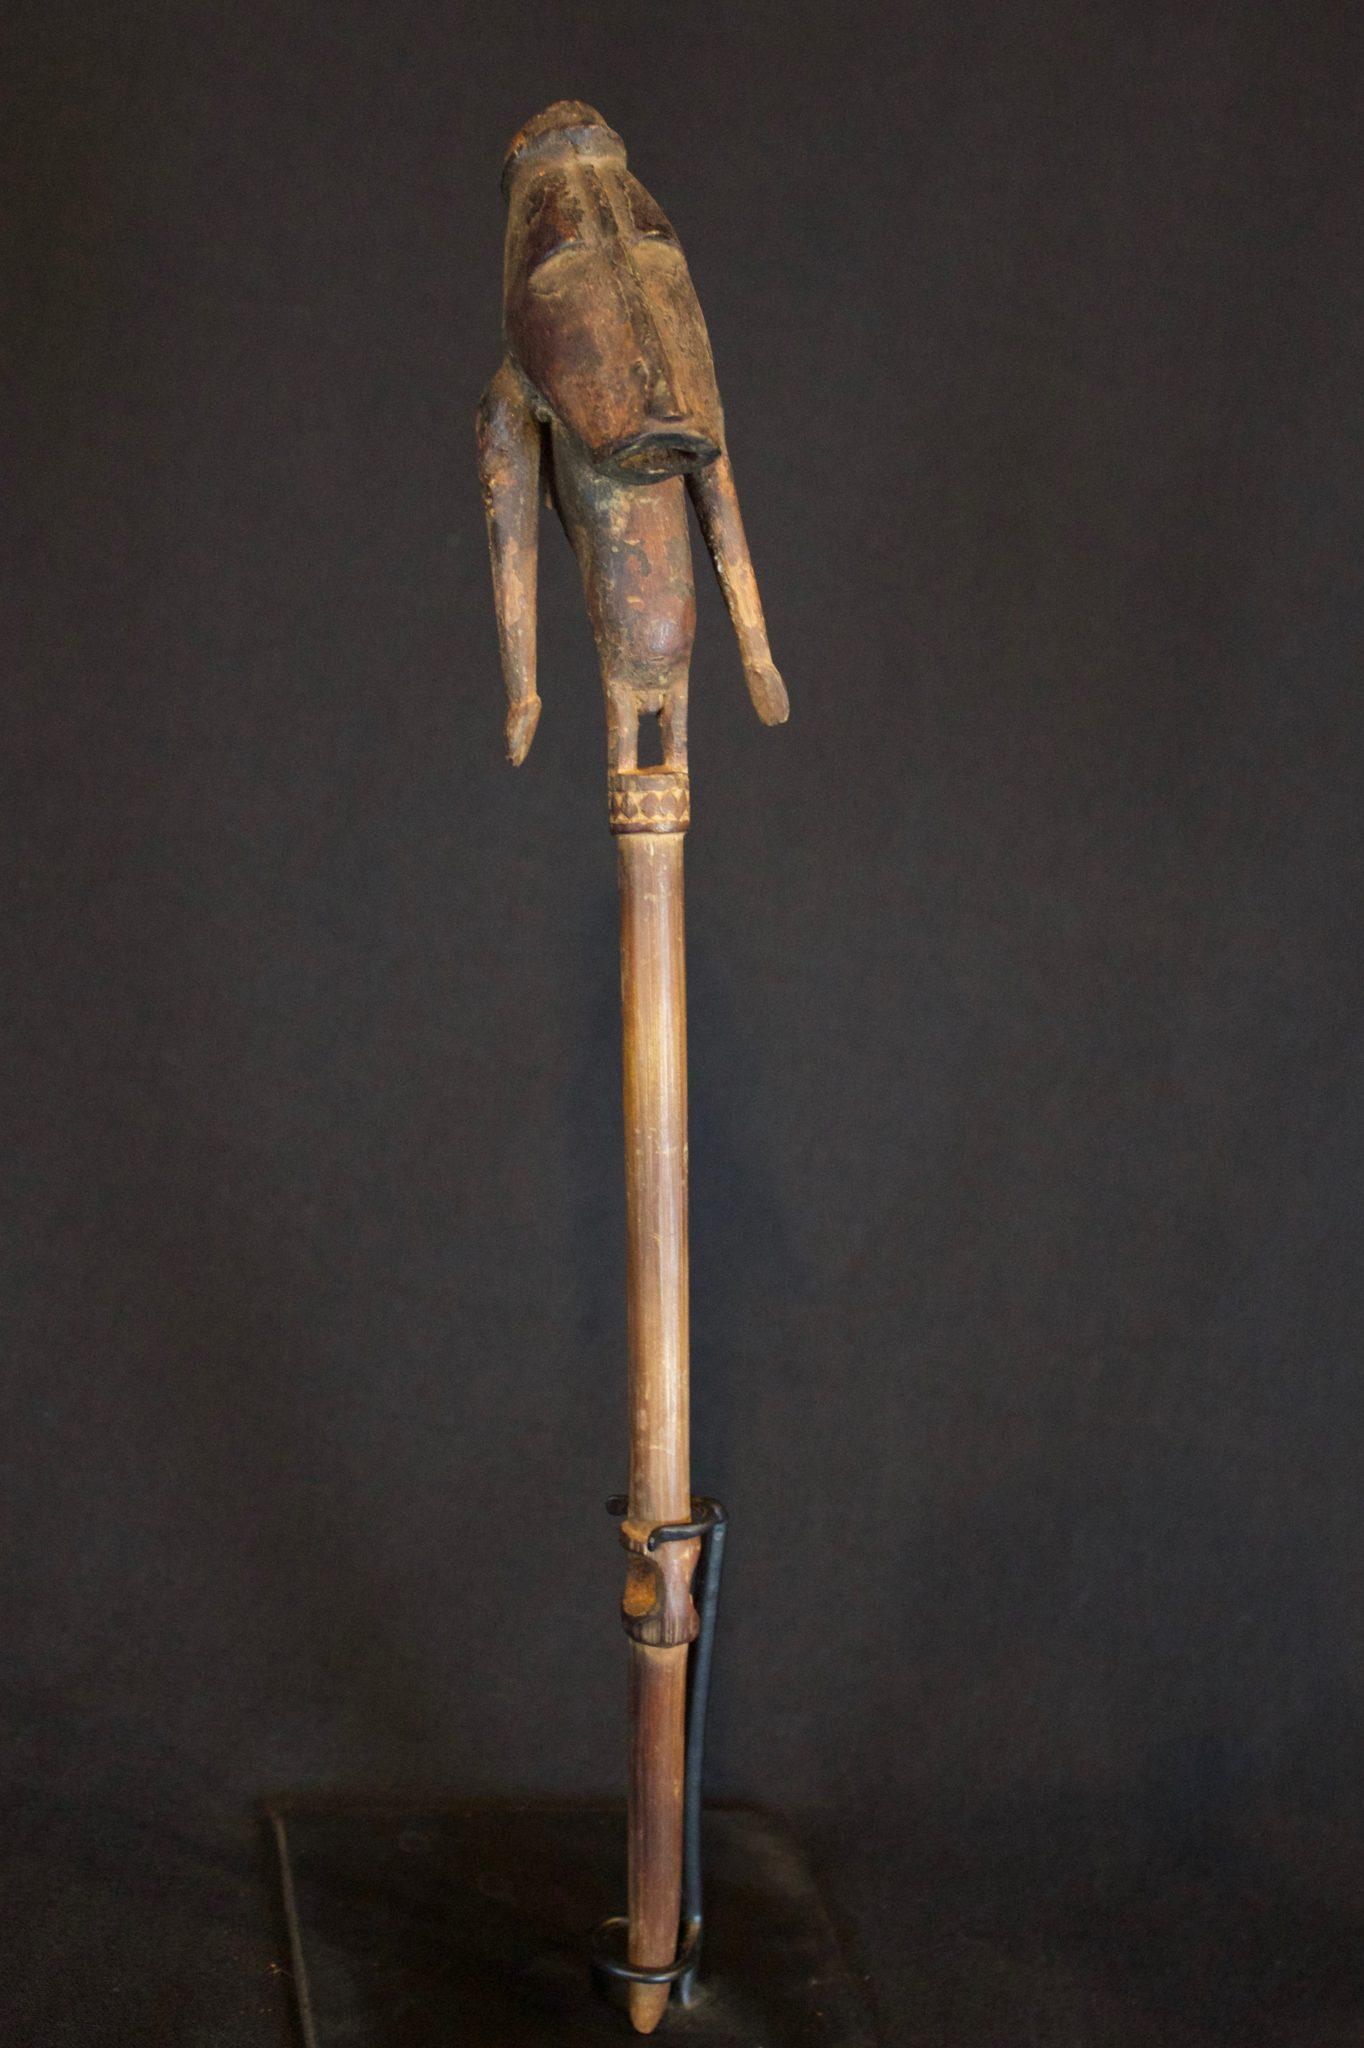 "Shaman Magic Figure, Papúa New Guinea, Indonesia, Early 20th c, Wood, fiber. Used in ritual ceremonies to stop rain. 11 ½"" x 1 ½"" x 1 ¼"", $135."